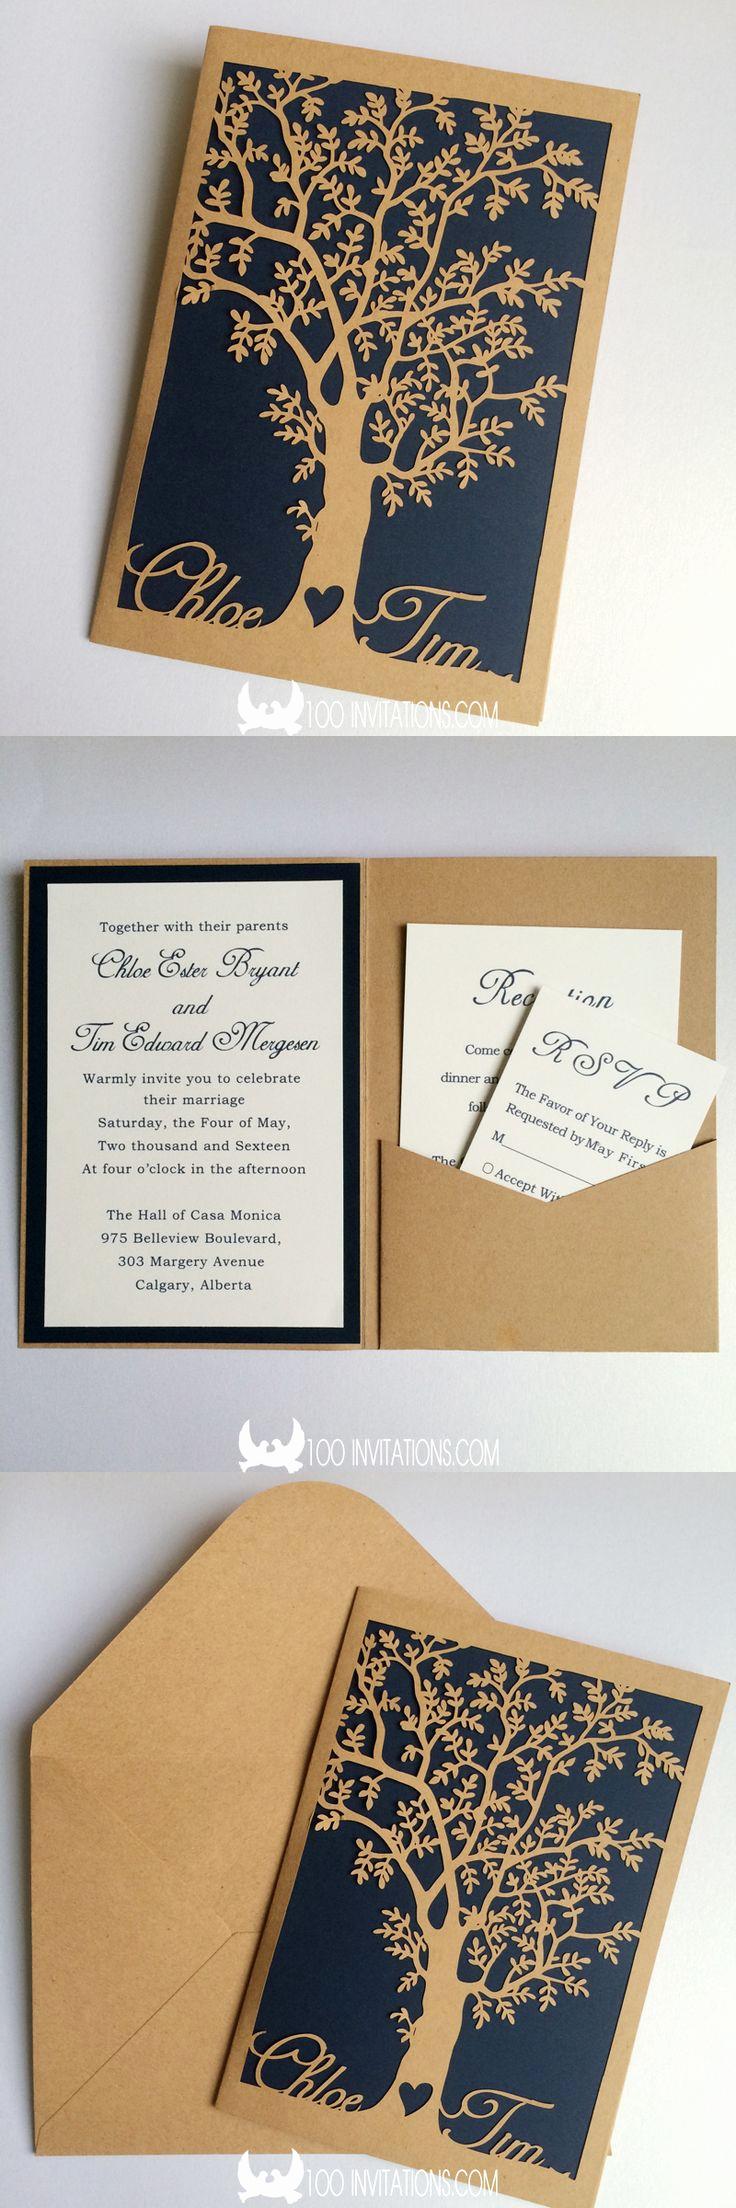 Cricut Wedding Invitation Ideas Beautiful 25 Best Ideas About Cricut Wedding Invitations On